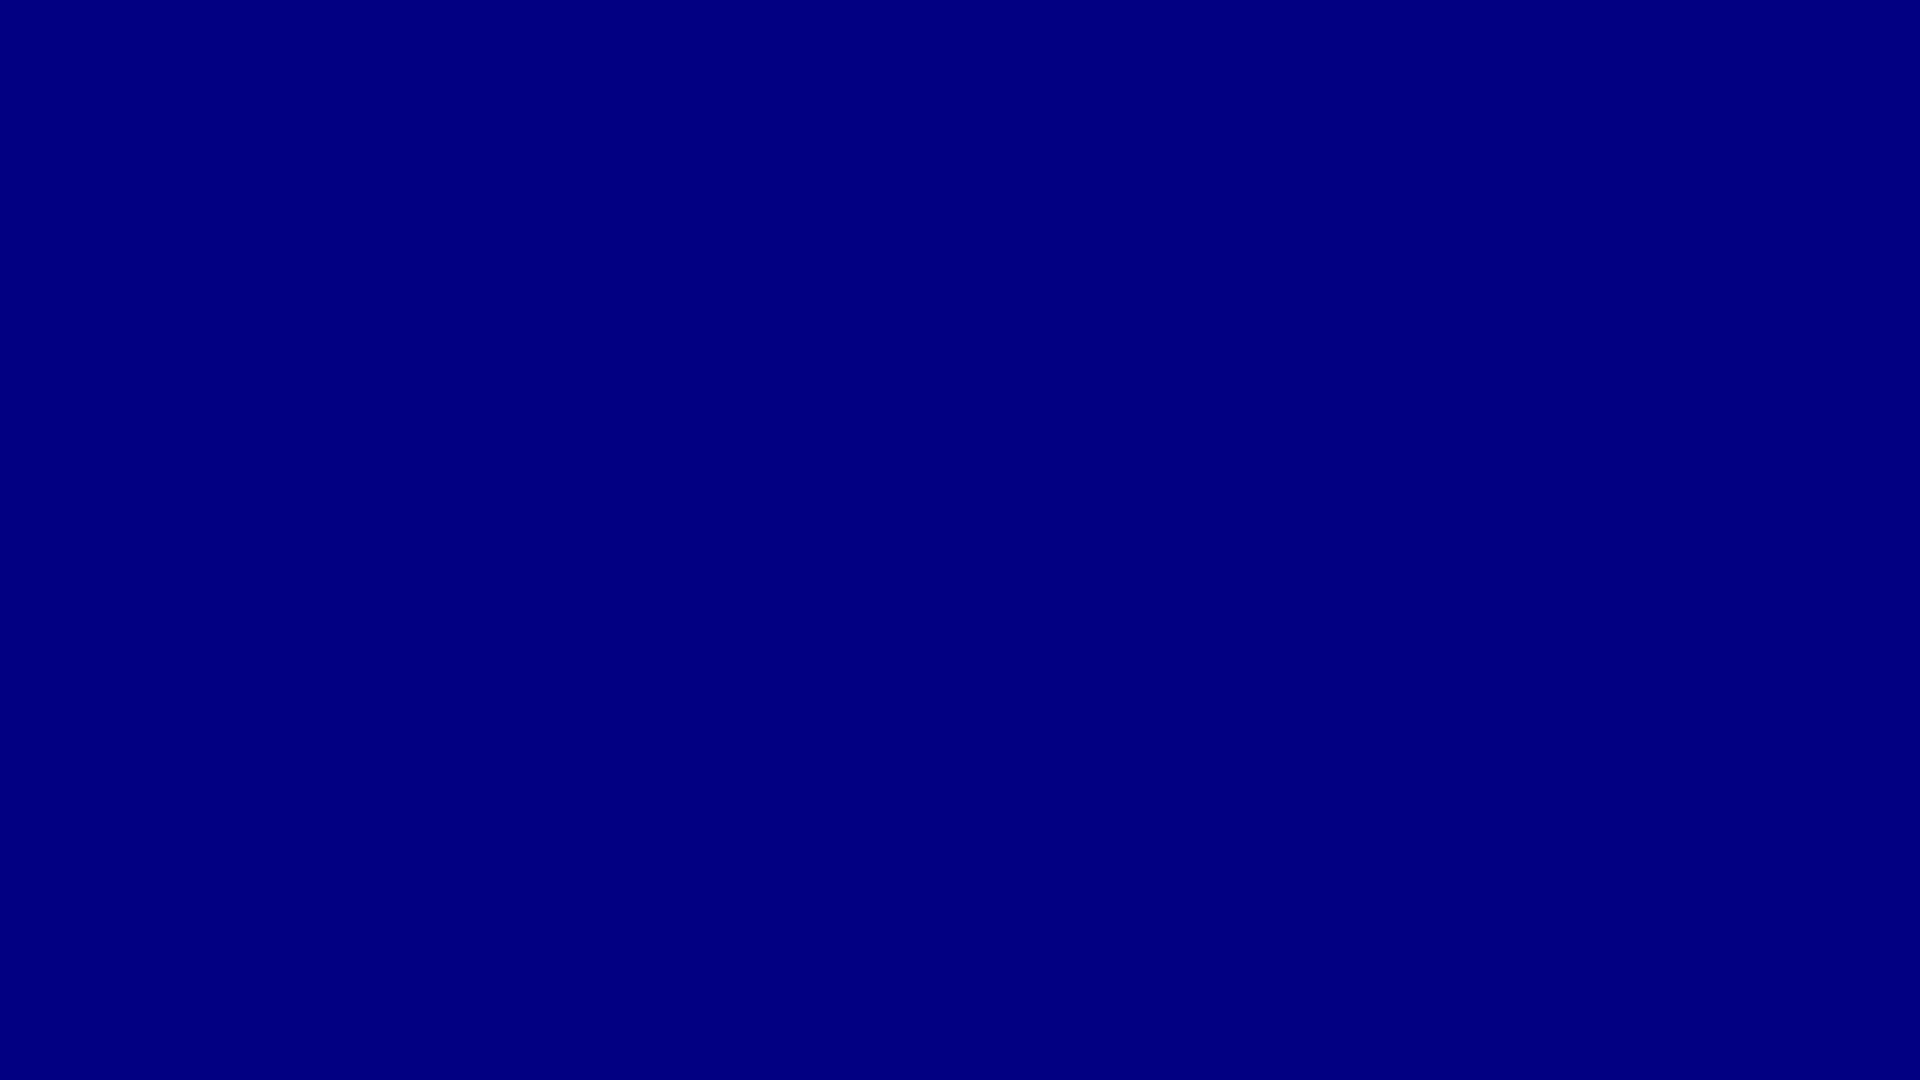 Navy Blue Background  Wallpapersafari. Seafood Kitchen Menu. Tiny Kitchens Ideas. Jcpenney Appliances Kitchen. Small Kitchen Organization Ideas. Coolest Kitchen Appliances. Italian Kitchen Knives. Paint Color Schemes Kitchen. Kitchen Backsplash Sheets